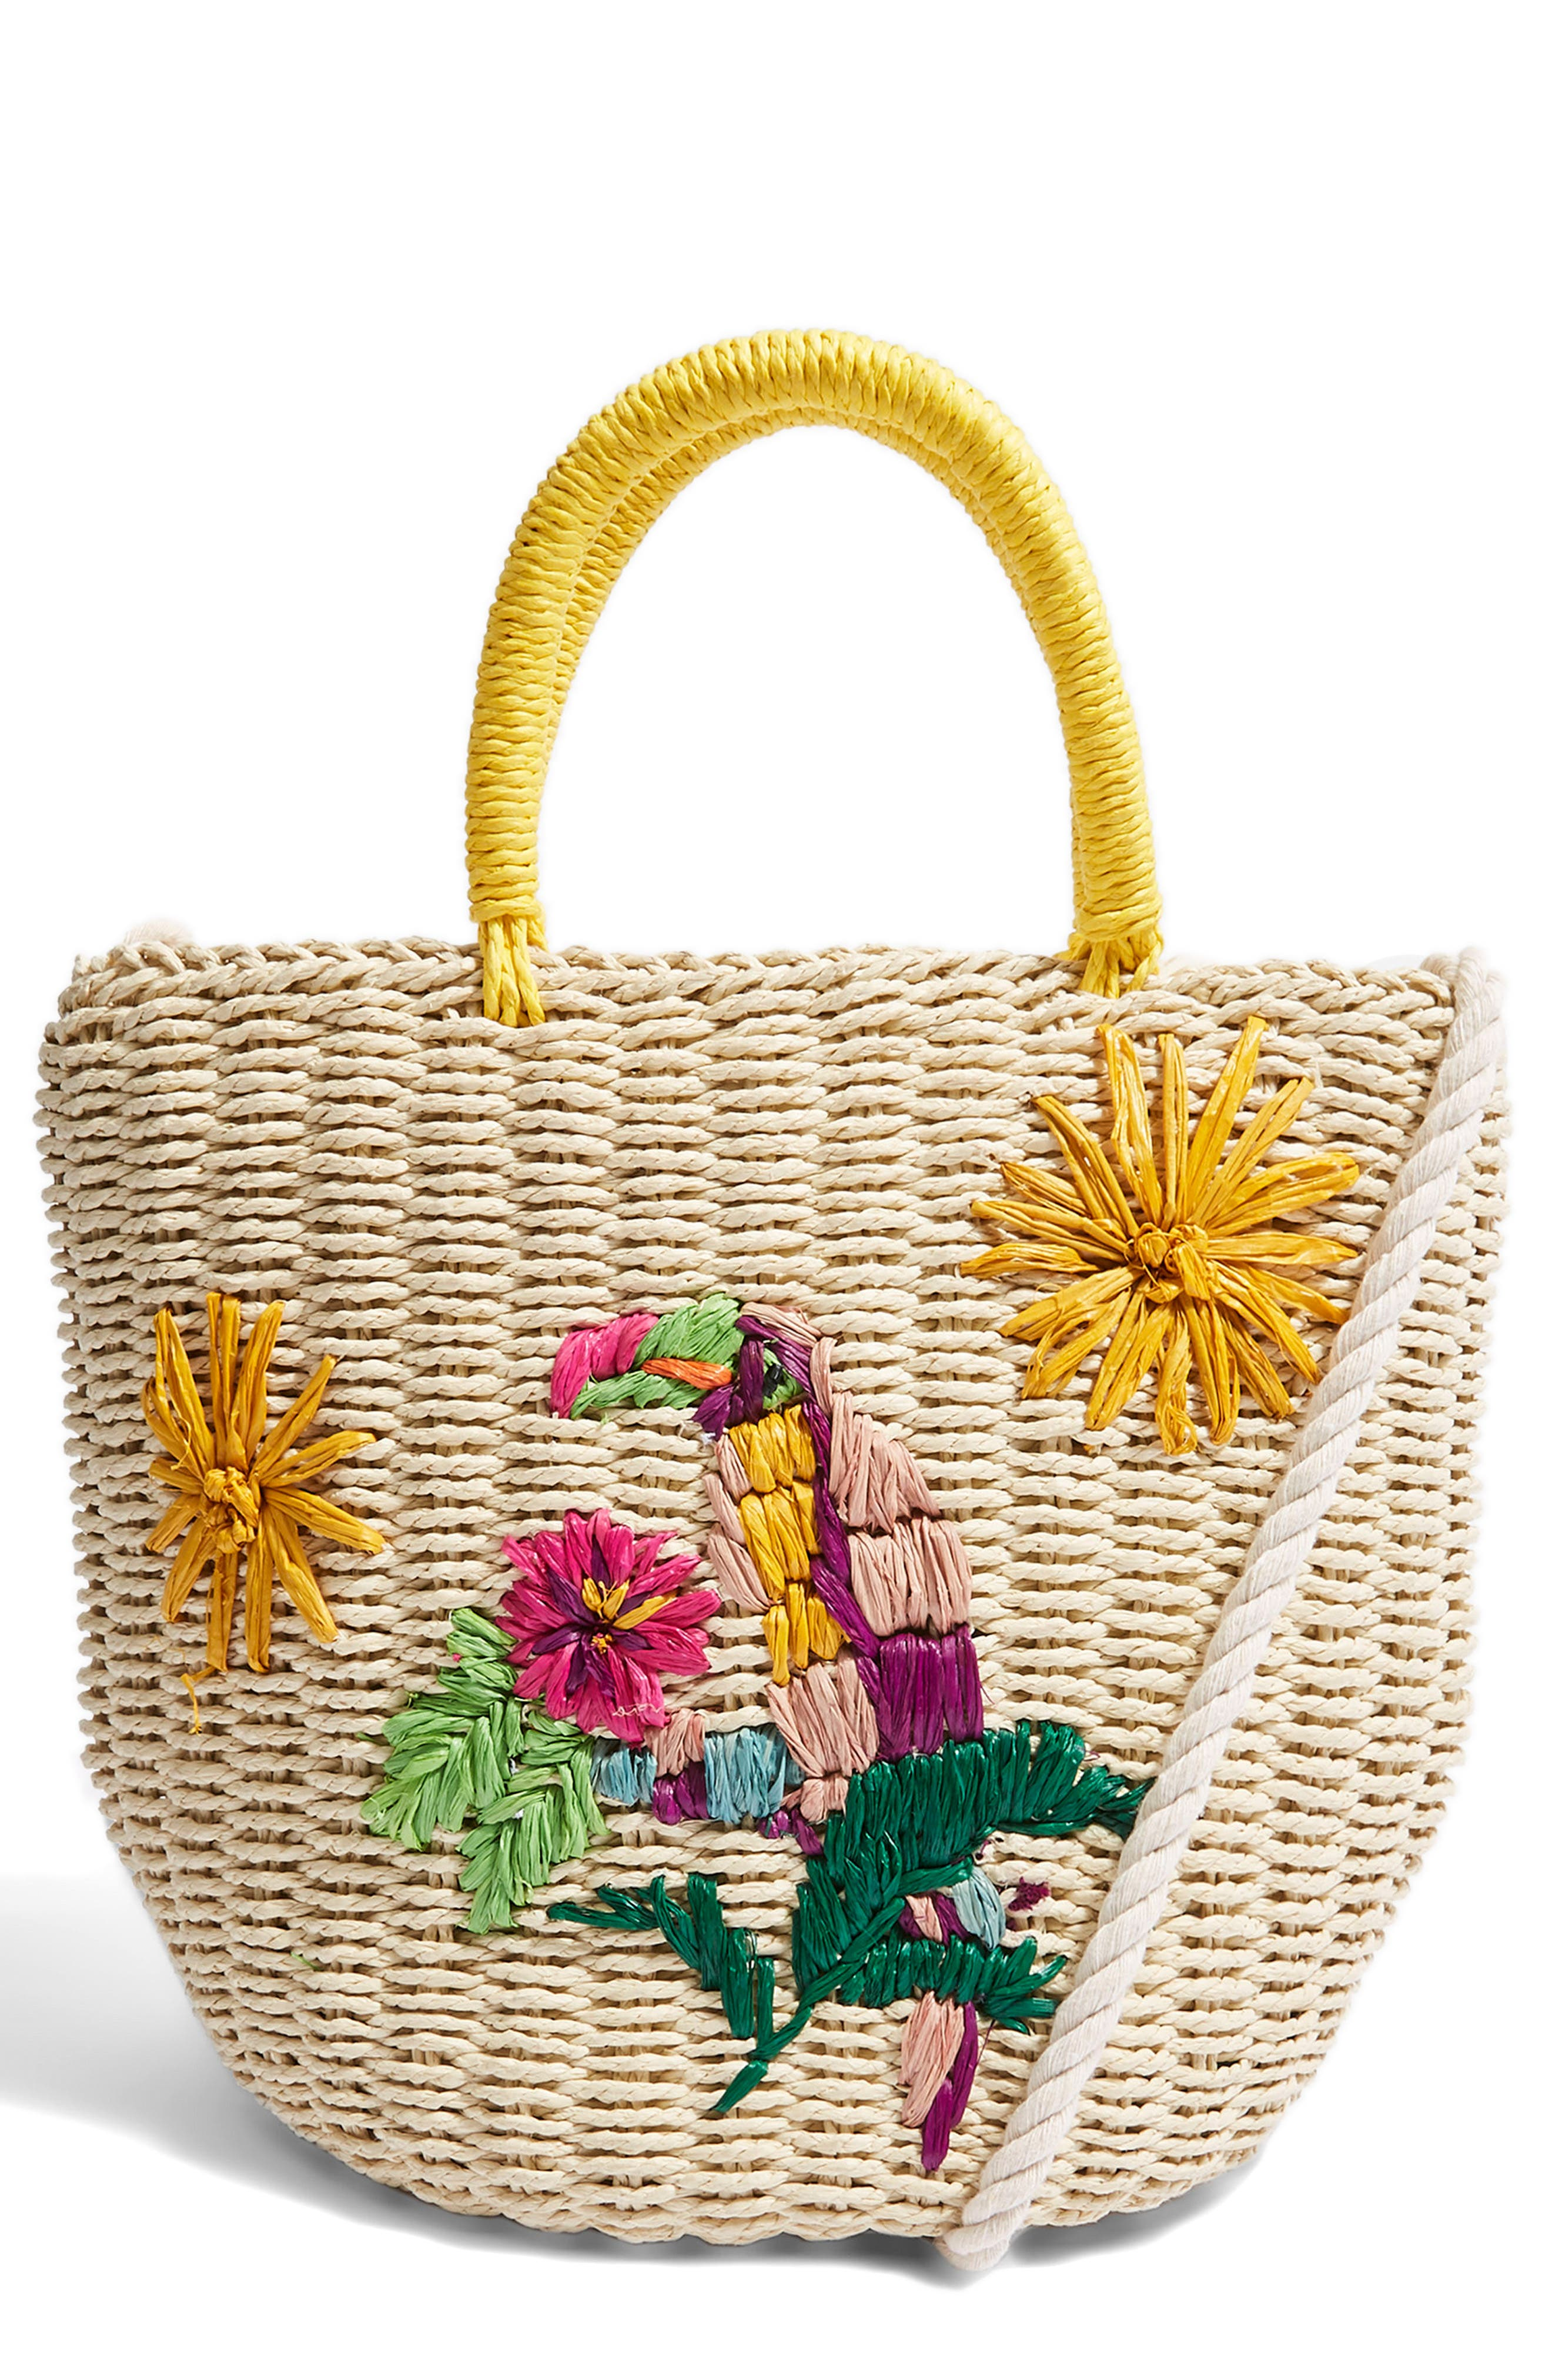 Topshop Betsy Toucan Straw Bag